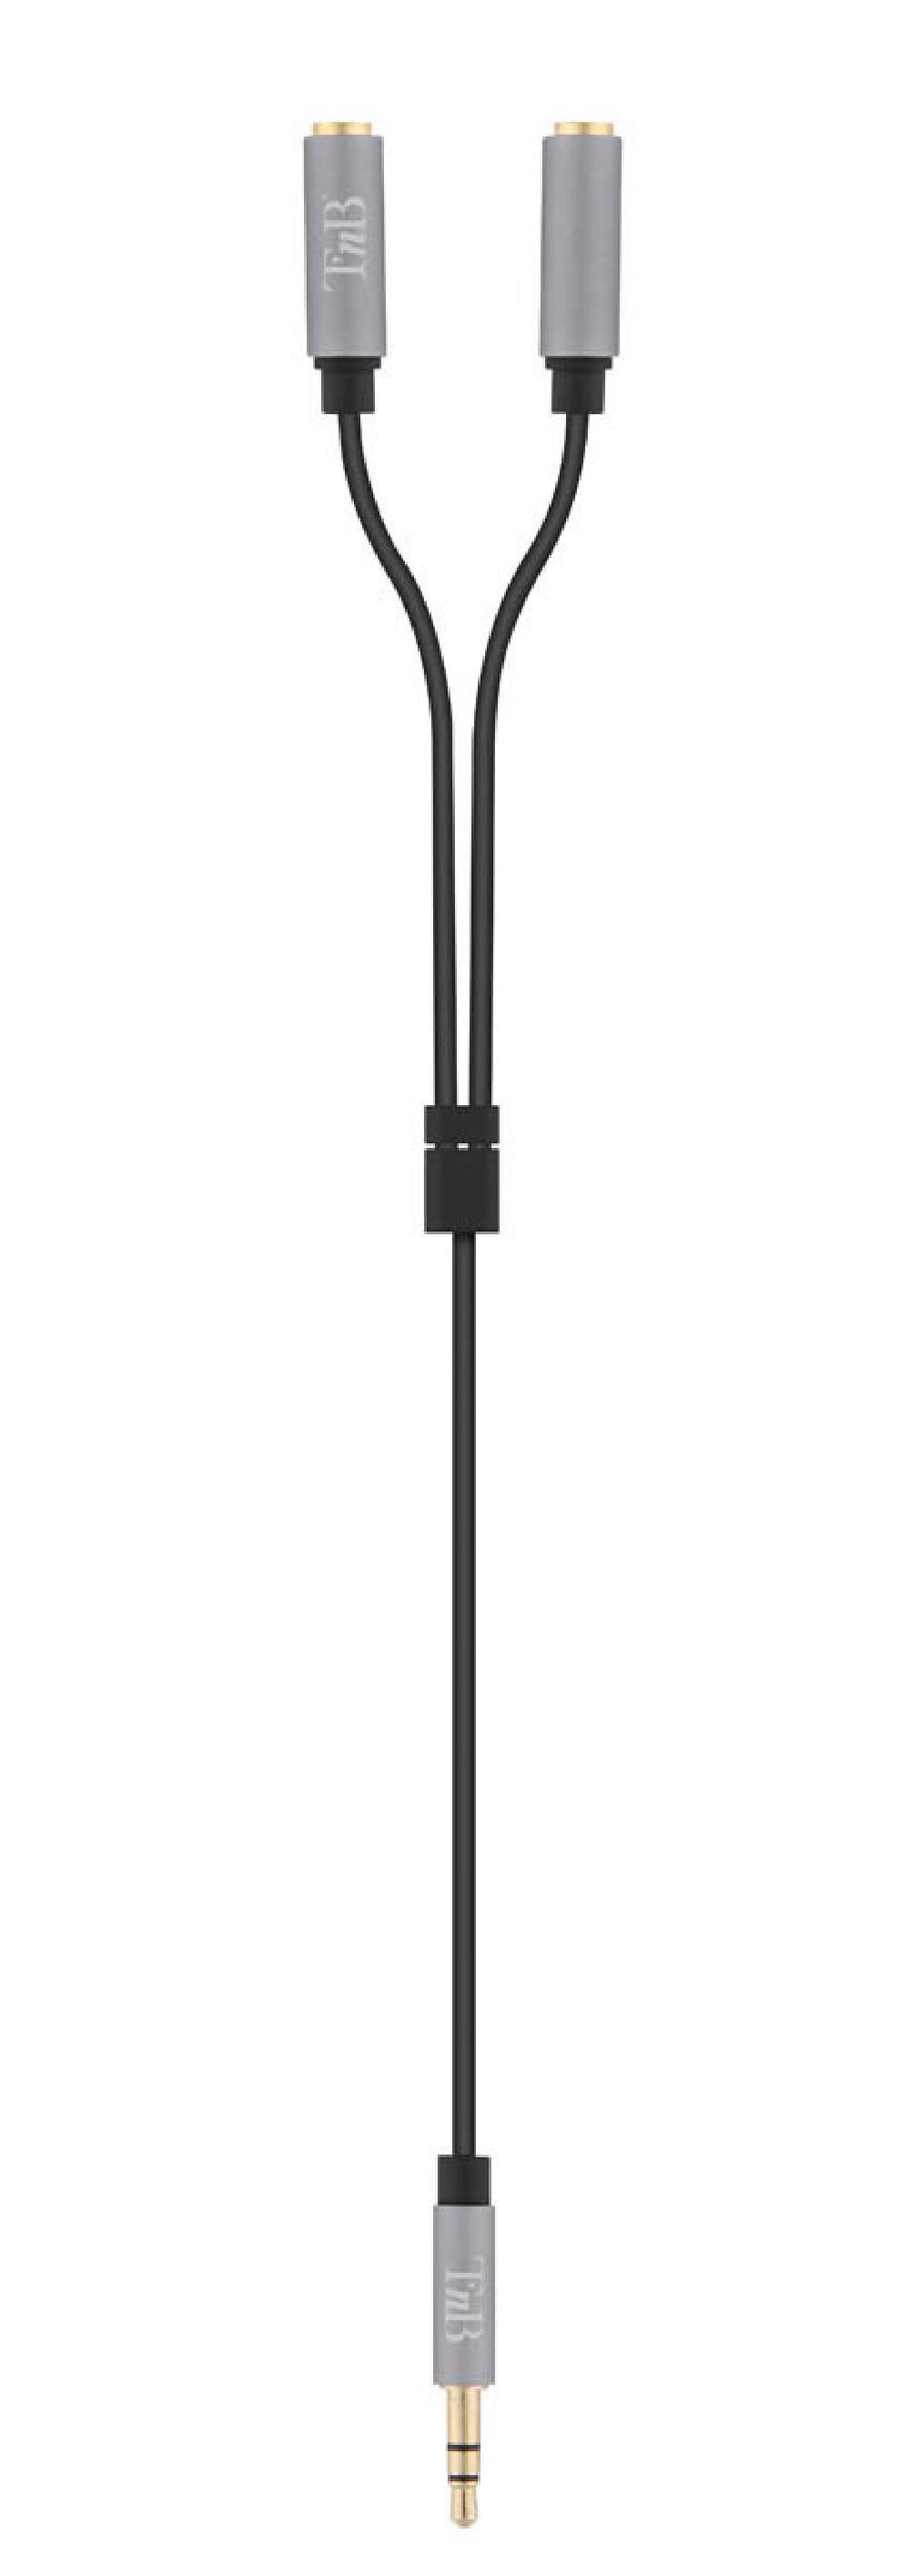 3.5MM JACK SPLITTER CABLE MALE/2 X FEMALE